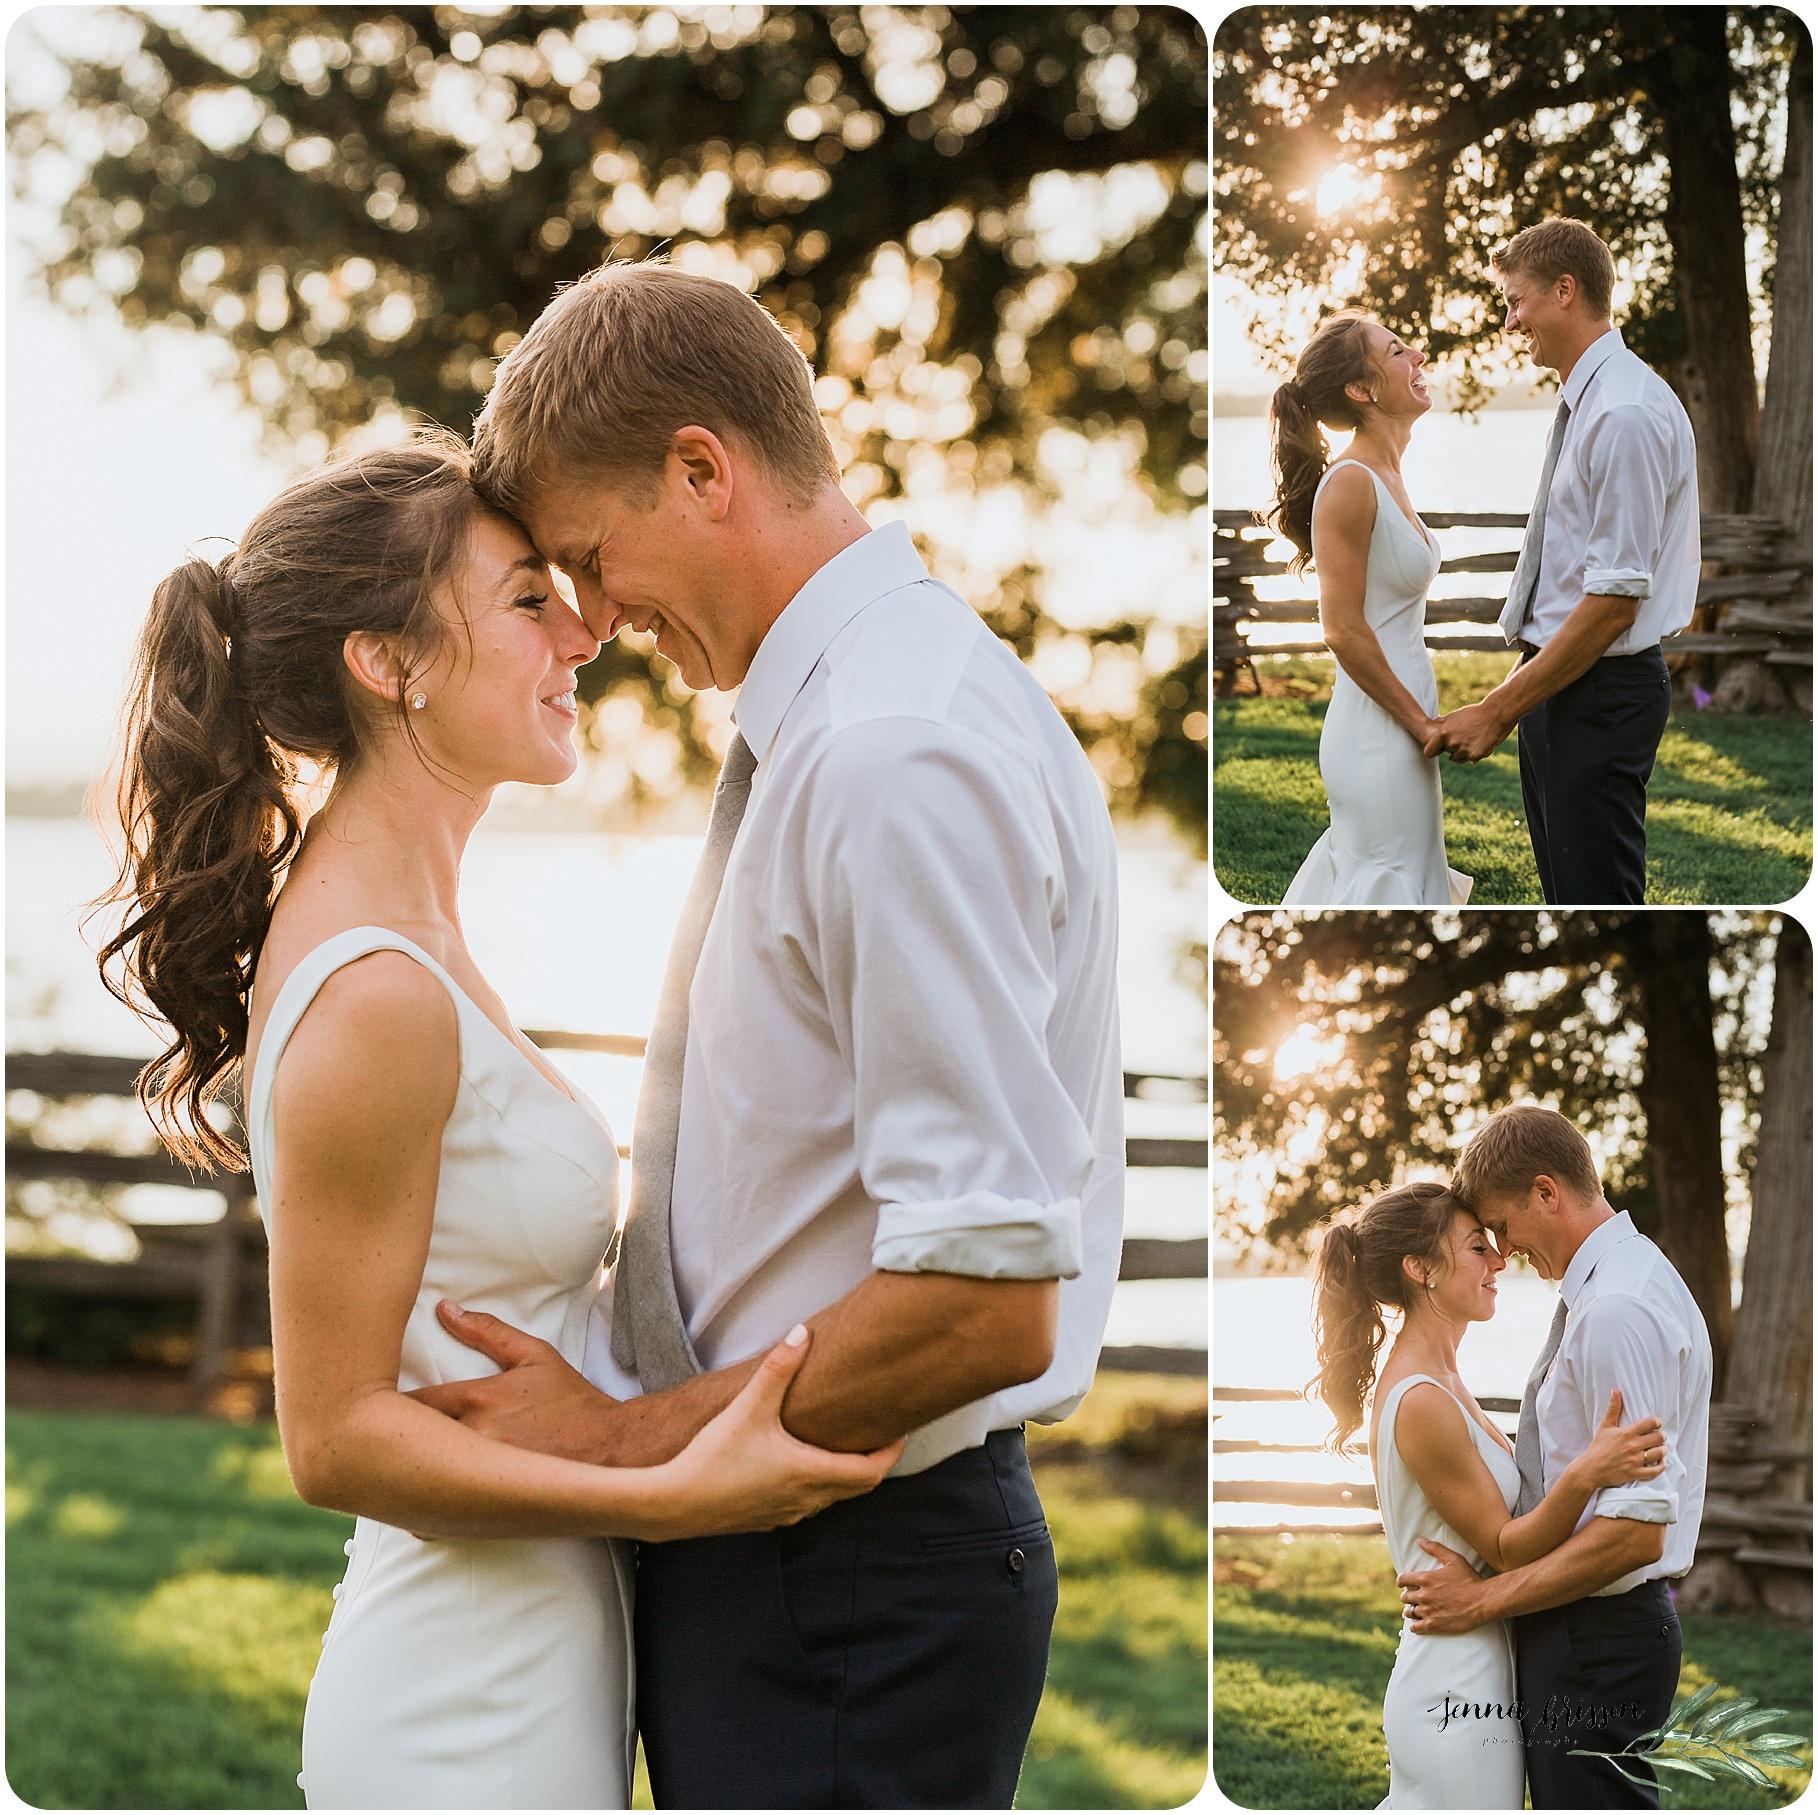 Vermont Sunset Wedding Portrait - Jenna Brisson Photography